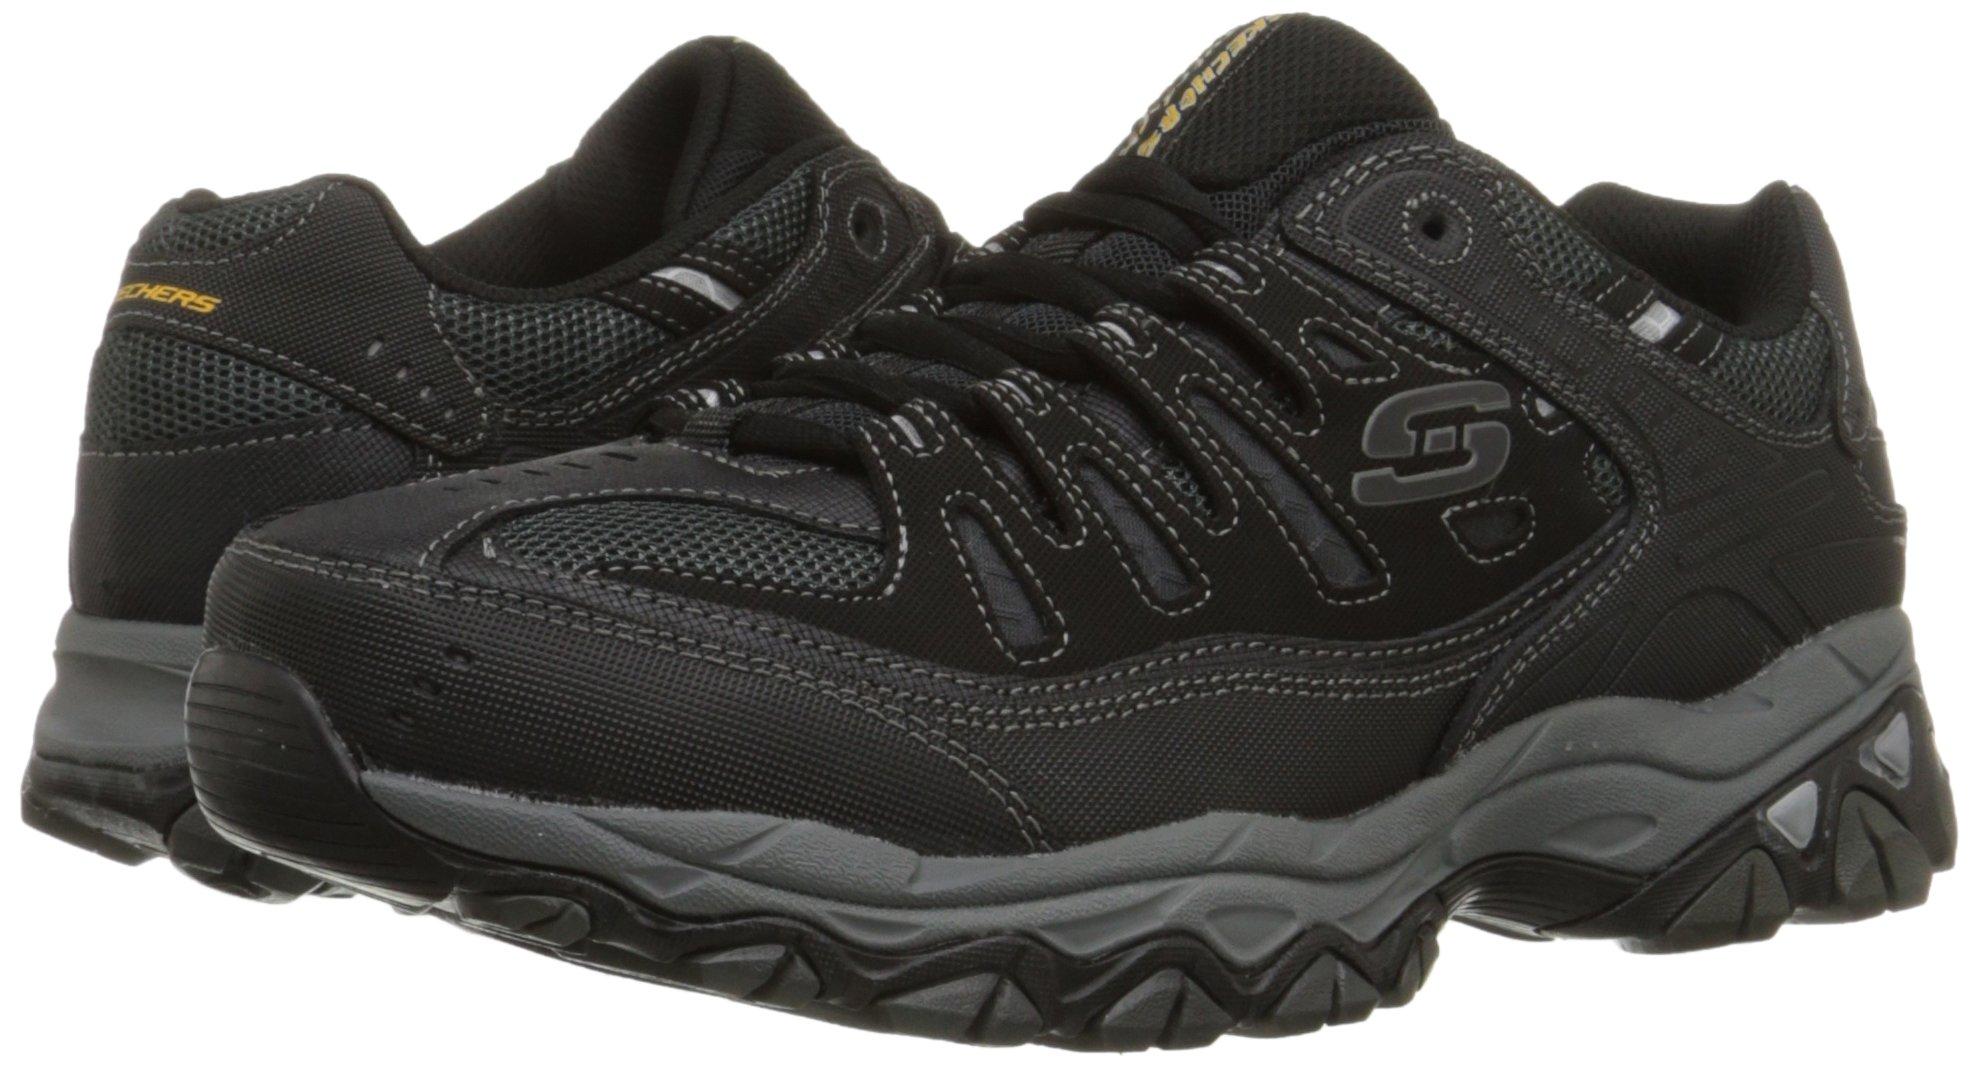 Skechers Men's AFTERBURNM.FIT Memory Foam Lace-Up Sneaker, Black, 6.5 M US by Skechers (Image #6)